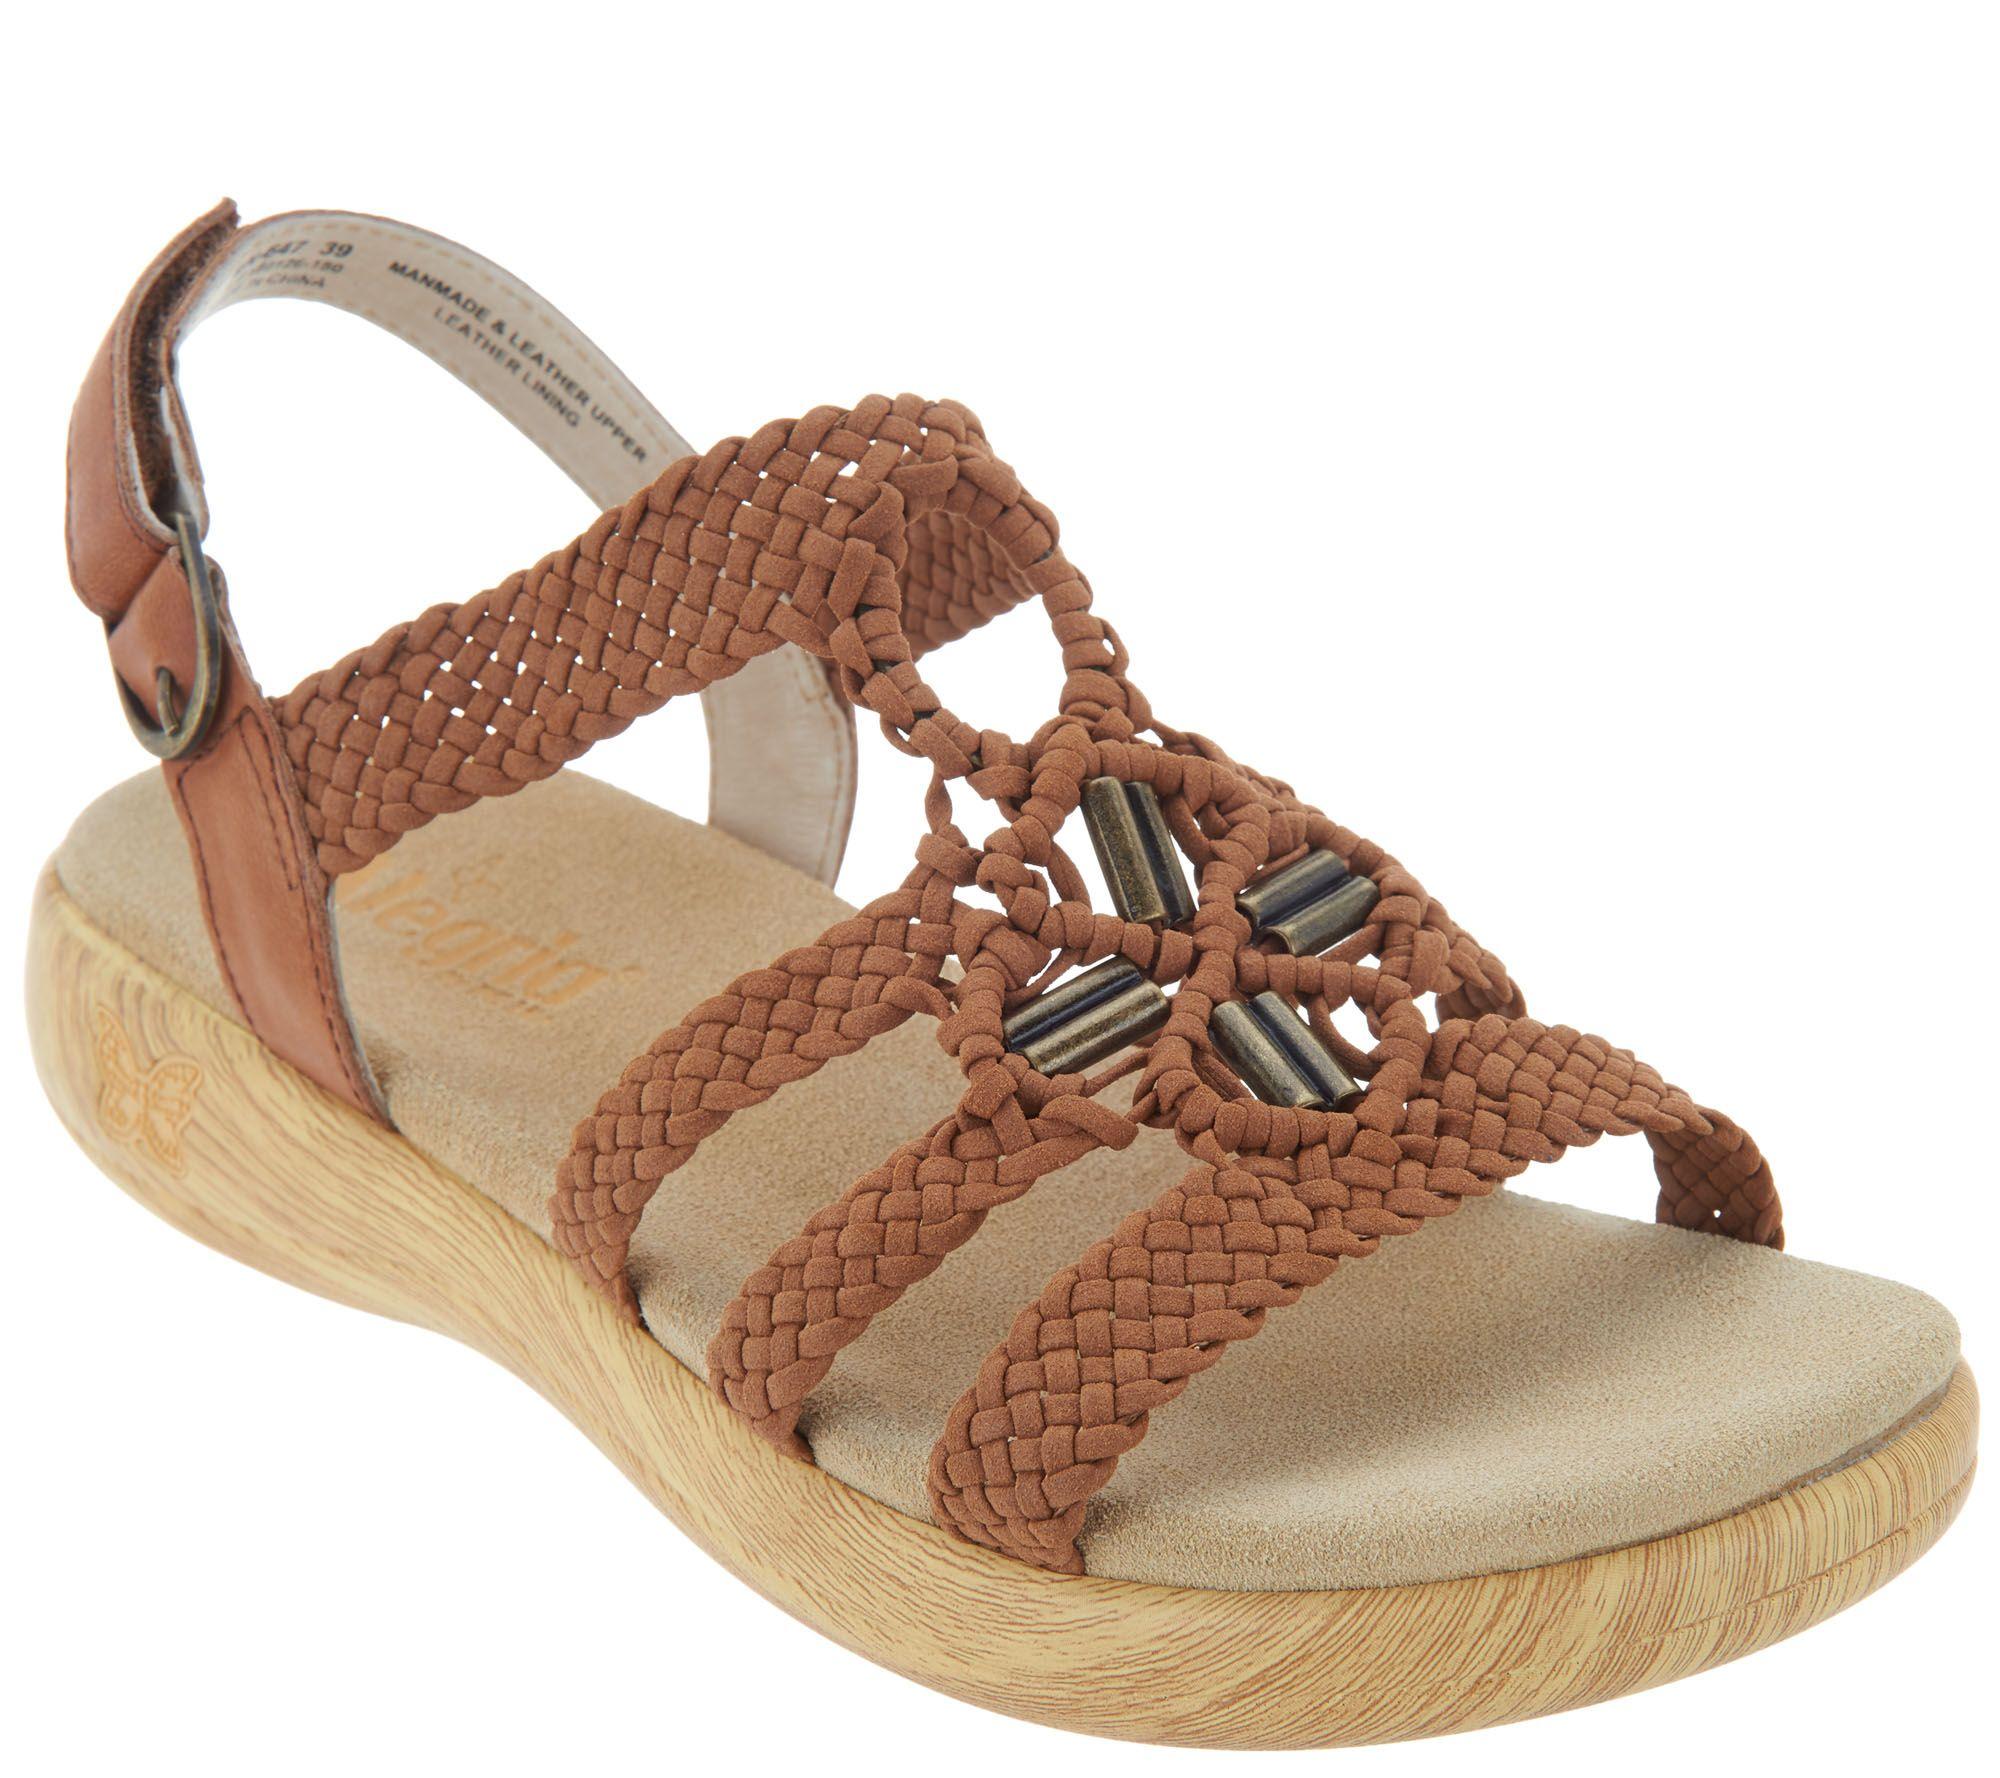 468c0f57808eab Alegria Braided Detail Sandals - Jena - Page 1 — QVC.com